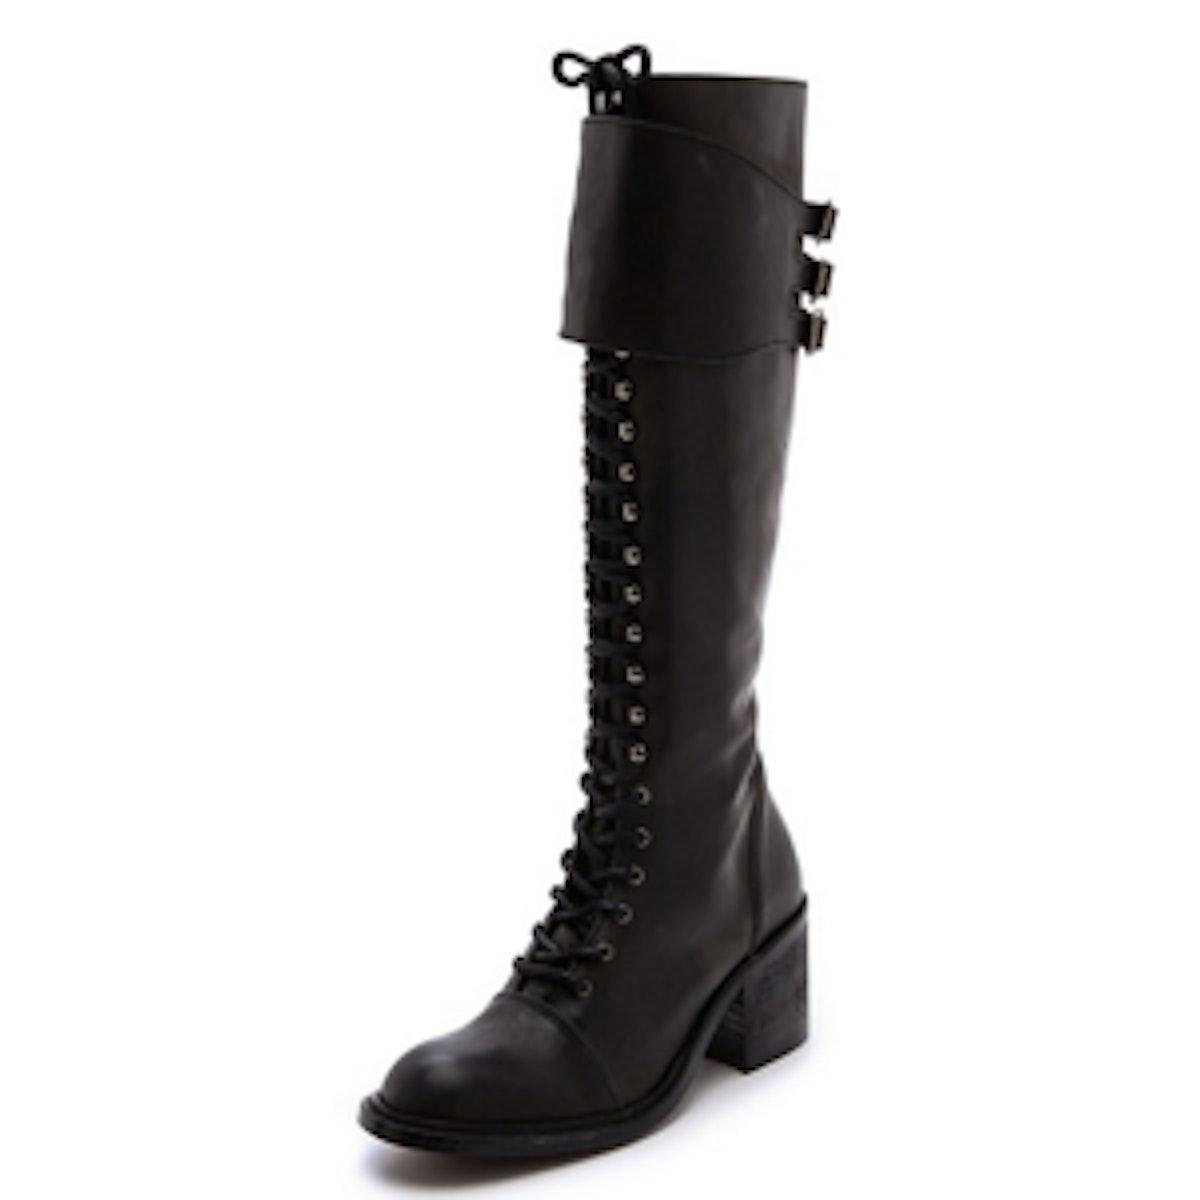 Tall Combat Boots